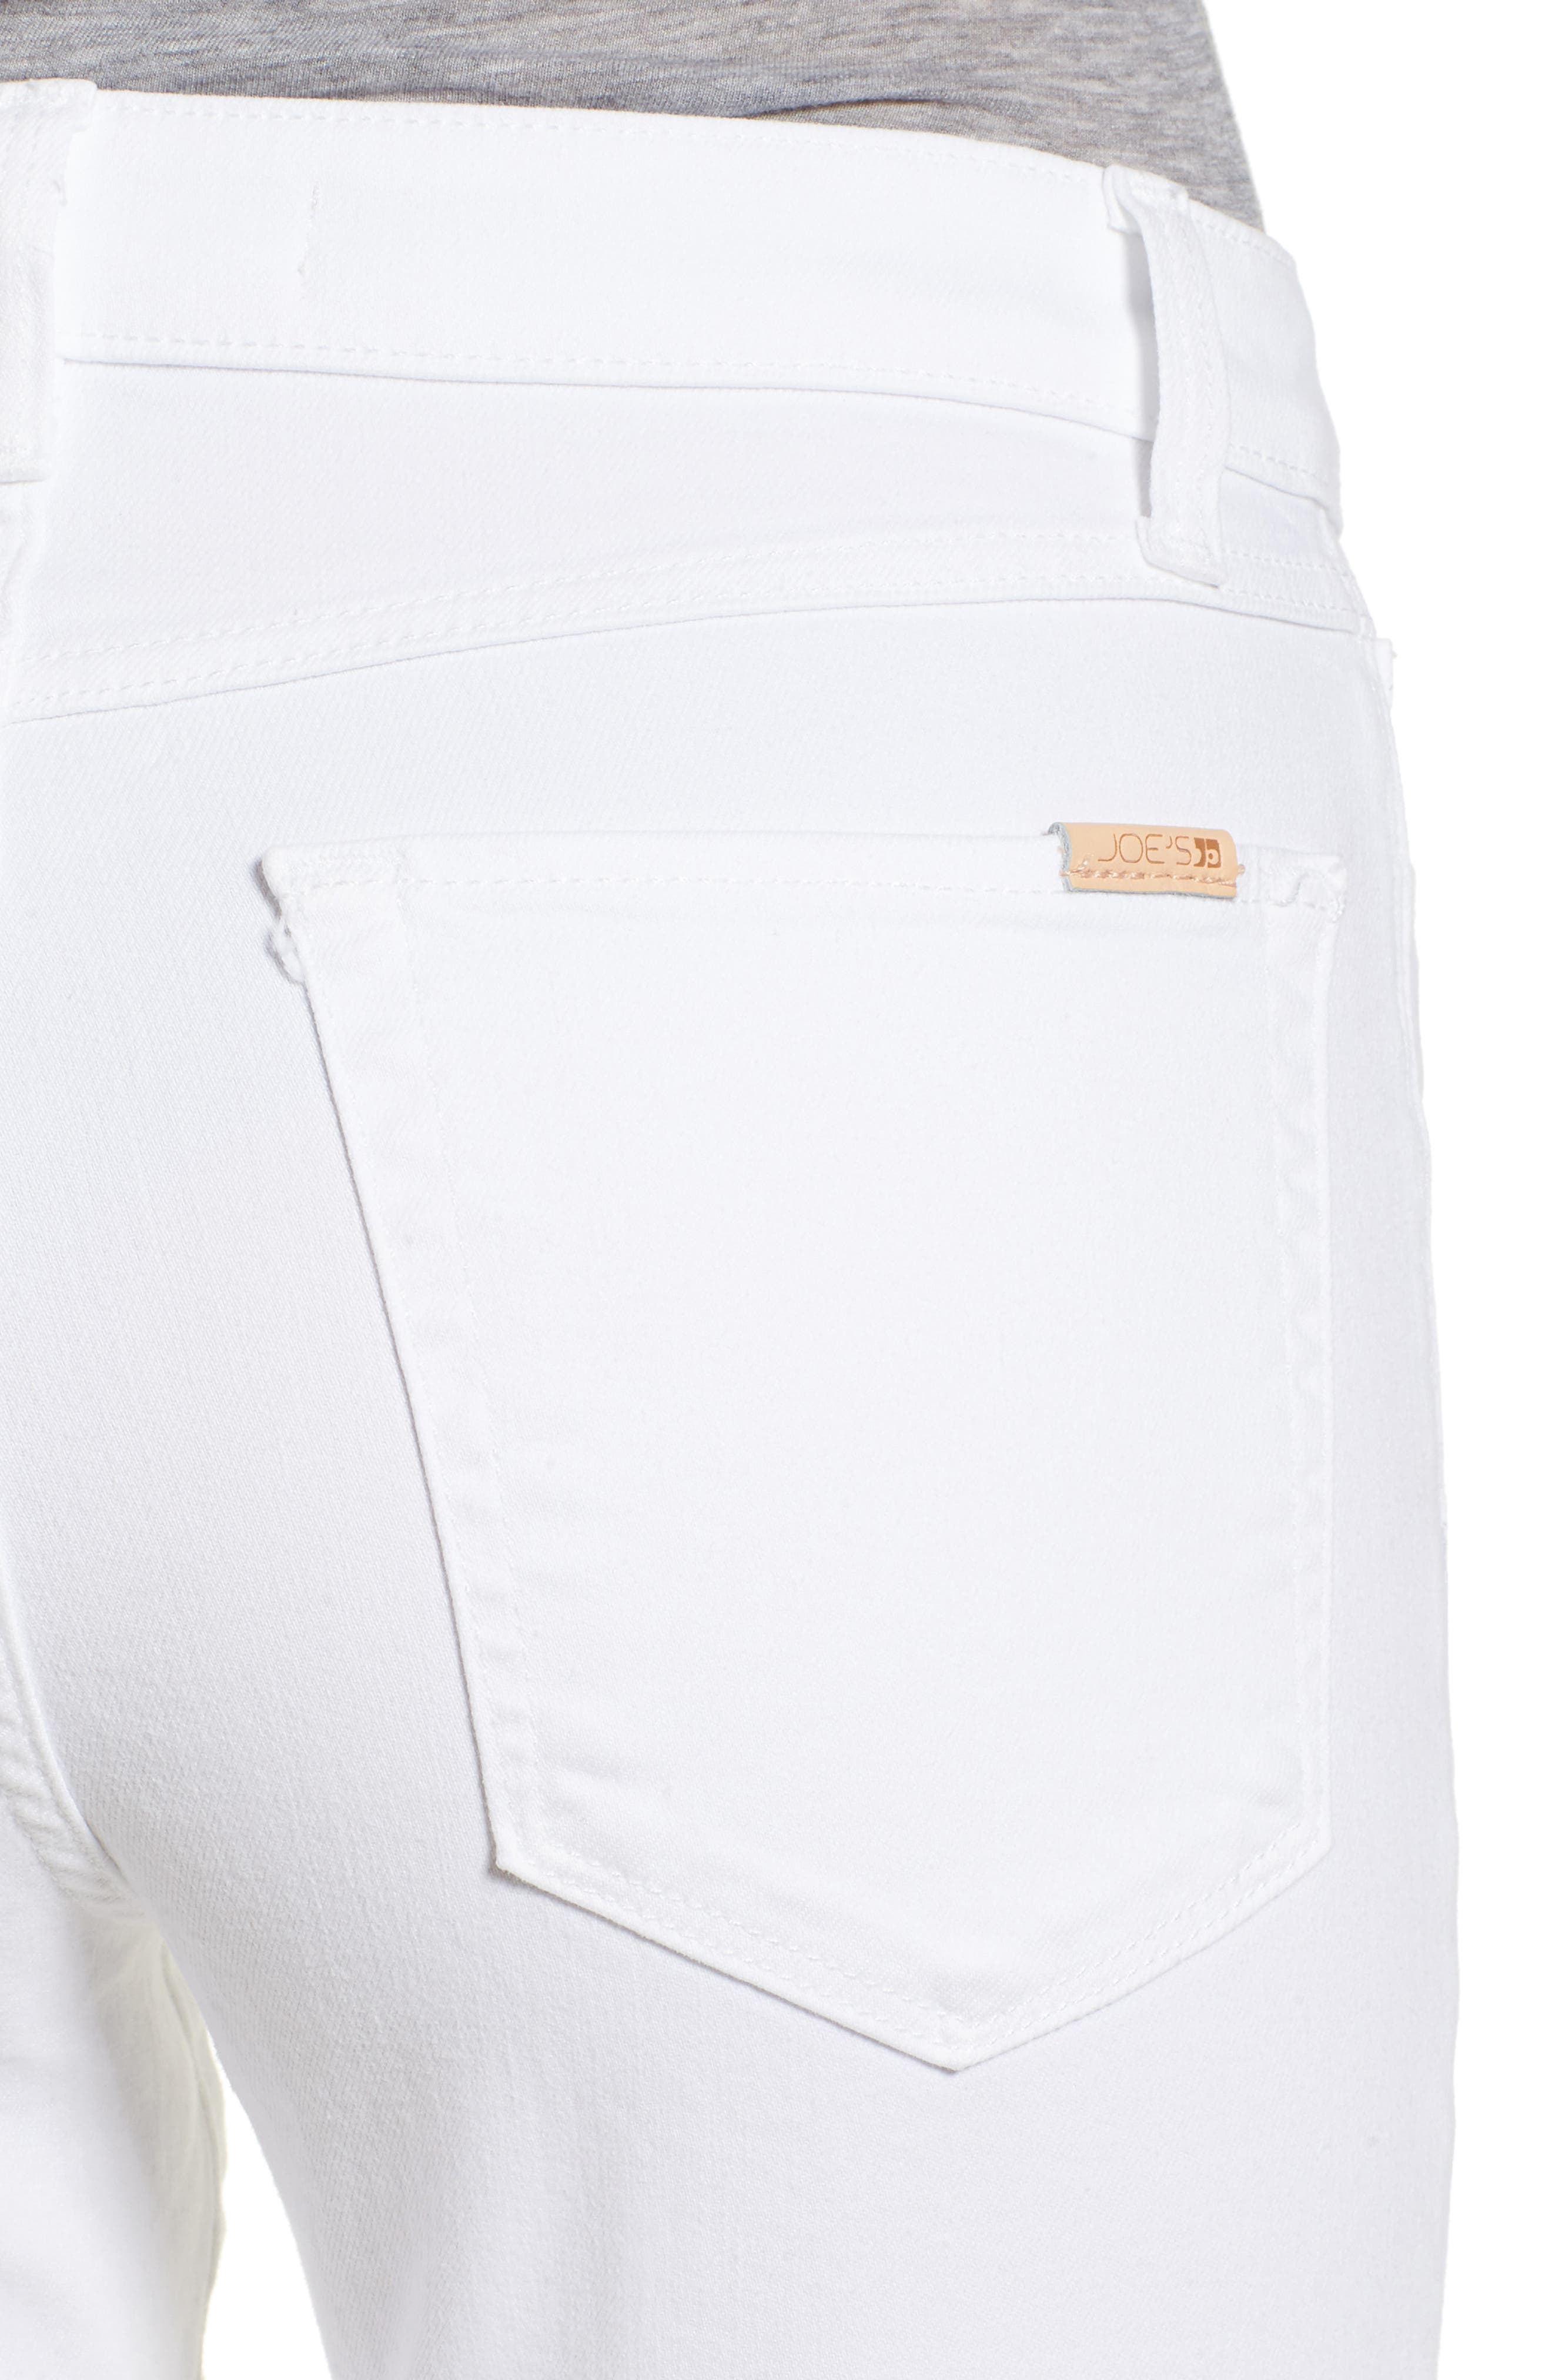 Charlie Skinny Jeans,                             Alternate thumbnail 4, color,                             HENNIE